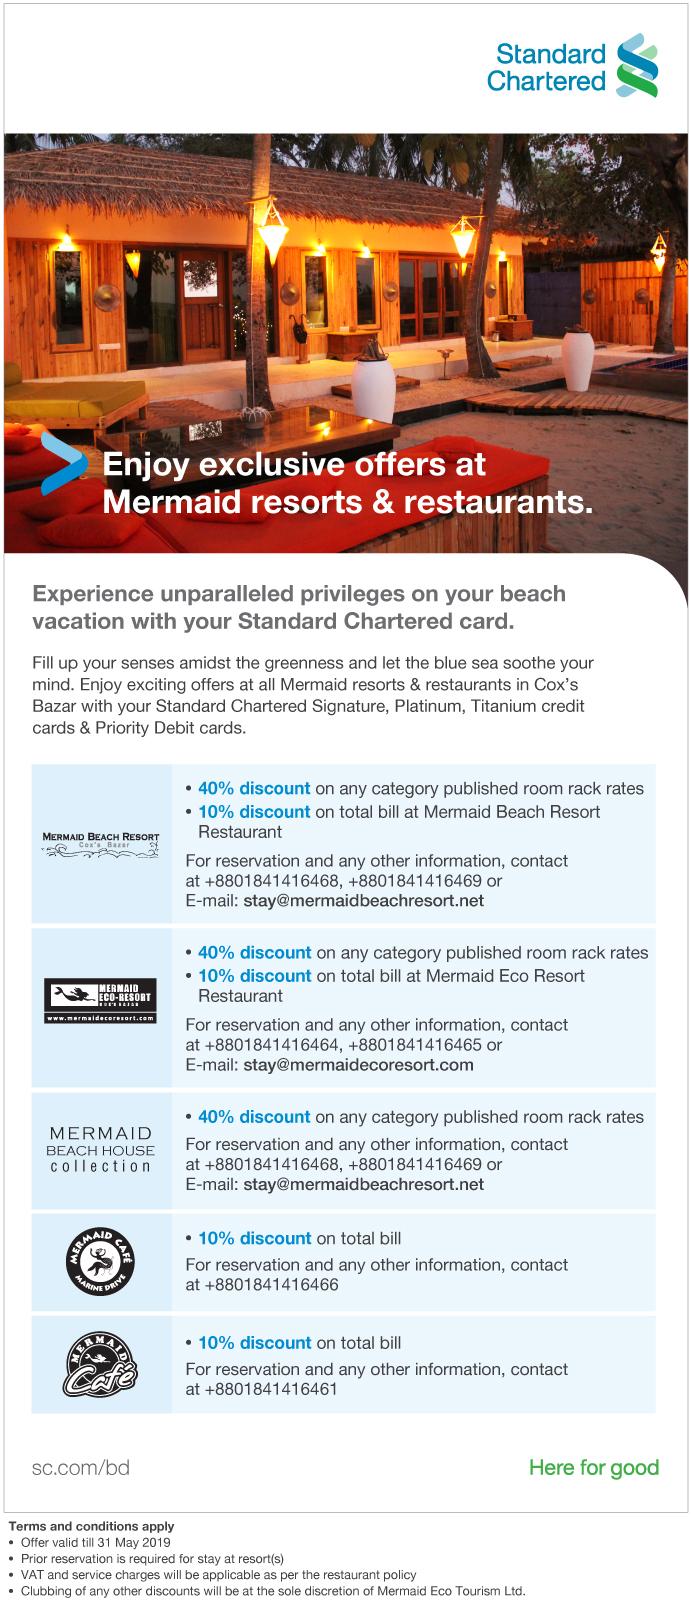 eDM_Mermaid-Resorts-&-Restaurants-offer